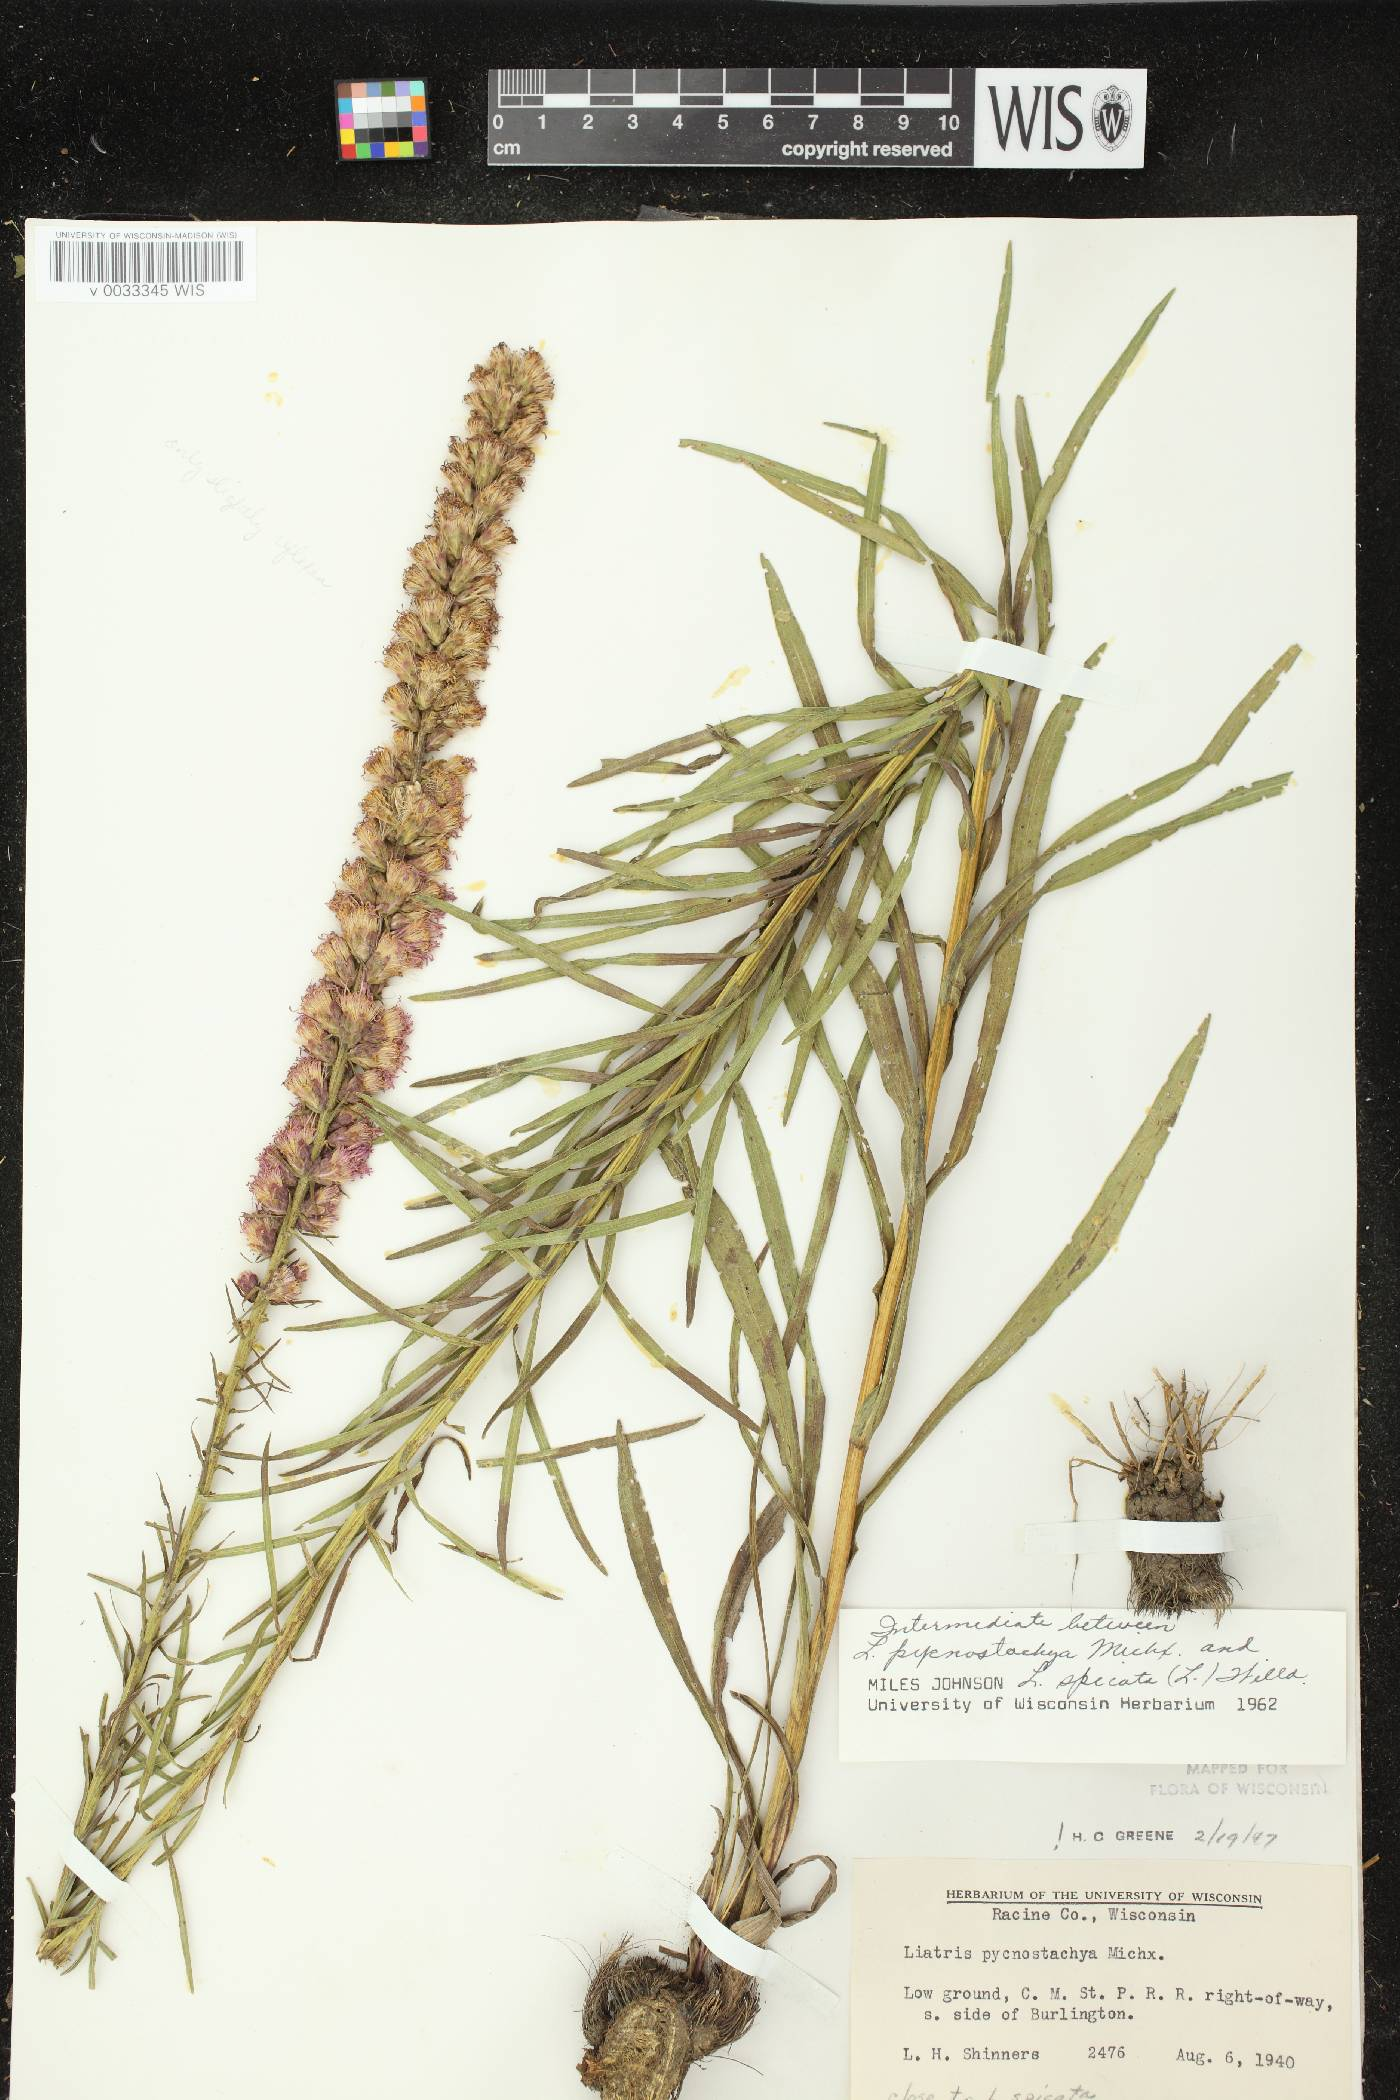 Liatris pycnostachya X L. spicata image